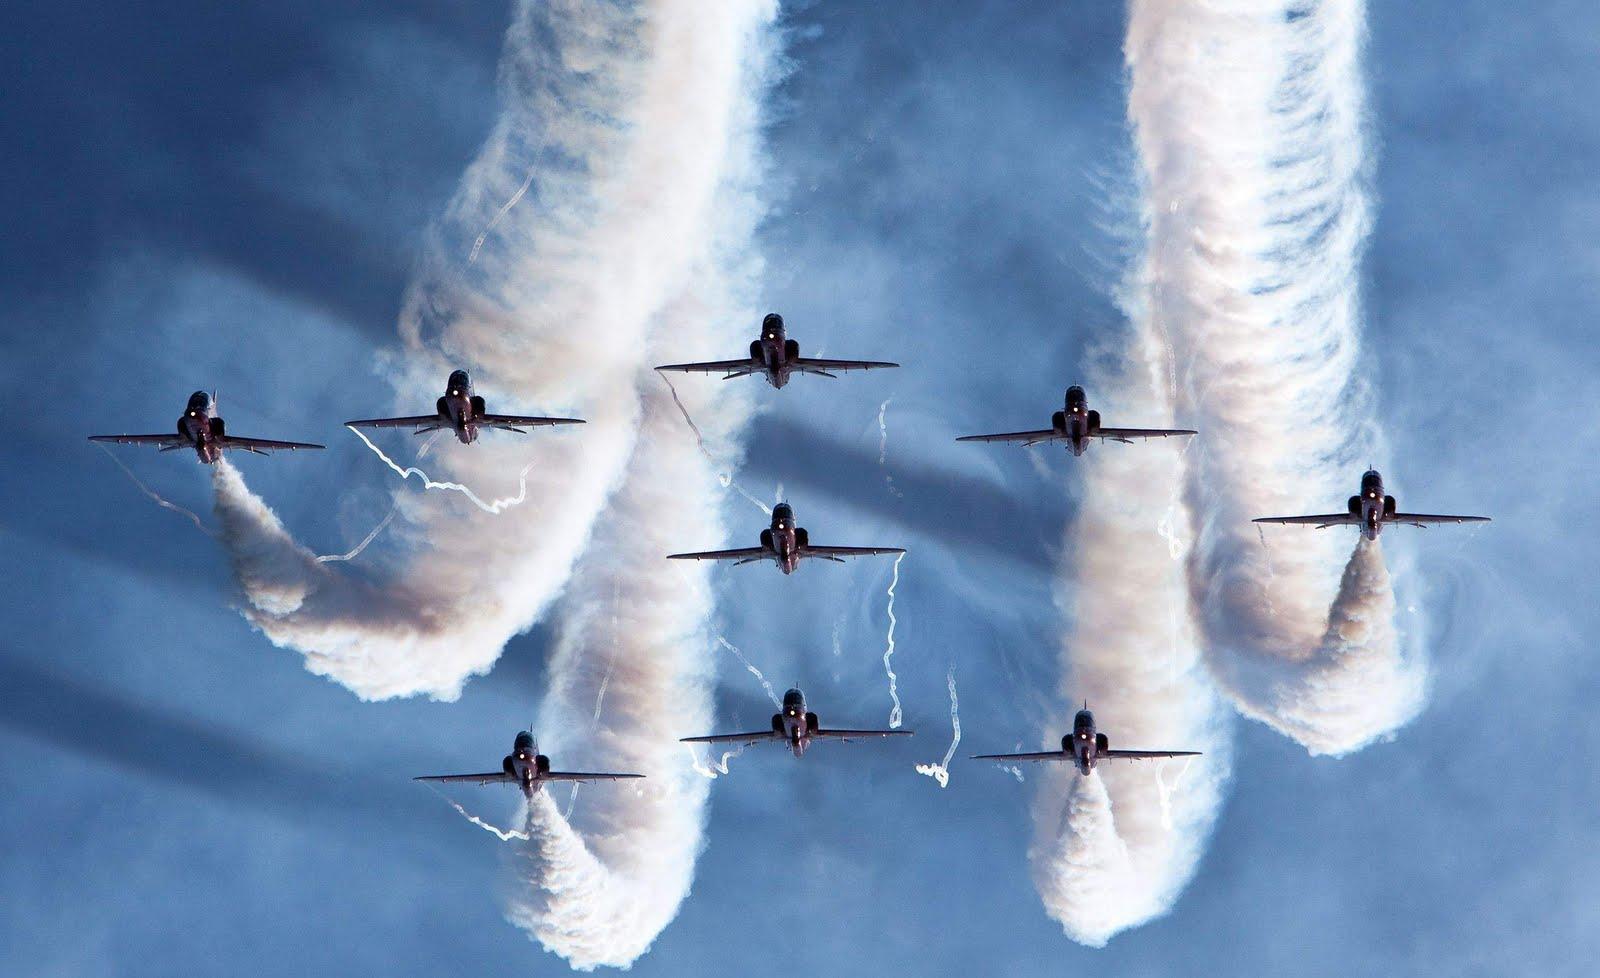 http://3.bp.blogspot.com/-aS80fU7UuJU/Tj9zF3_pIBI/AAAAAAAAAsQ/cyRBwMrVZis/s1600/Airforce_Fair-hd-desktop-wallpaper2560_1600.jpg